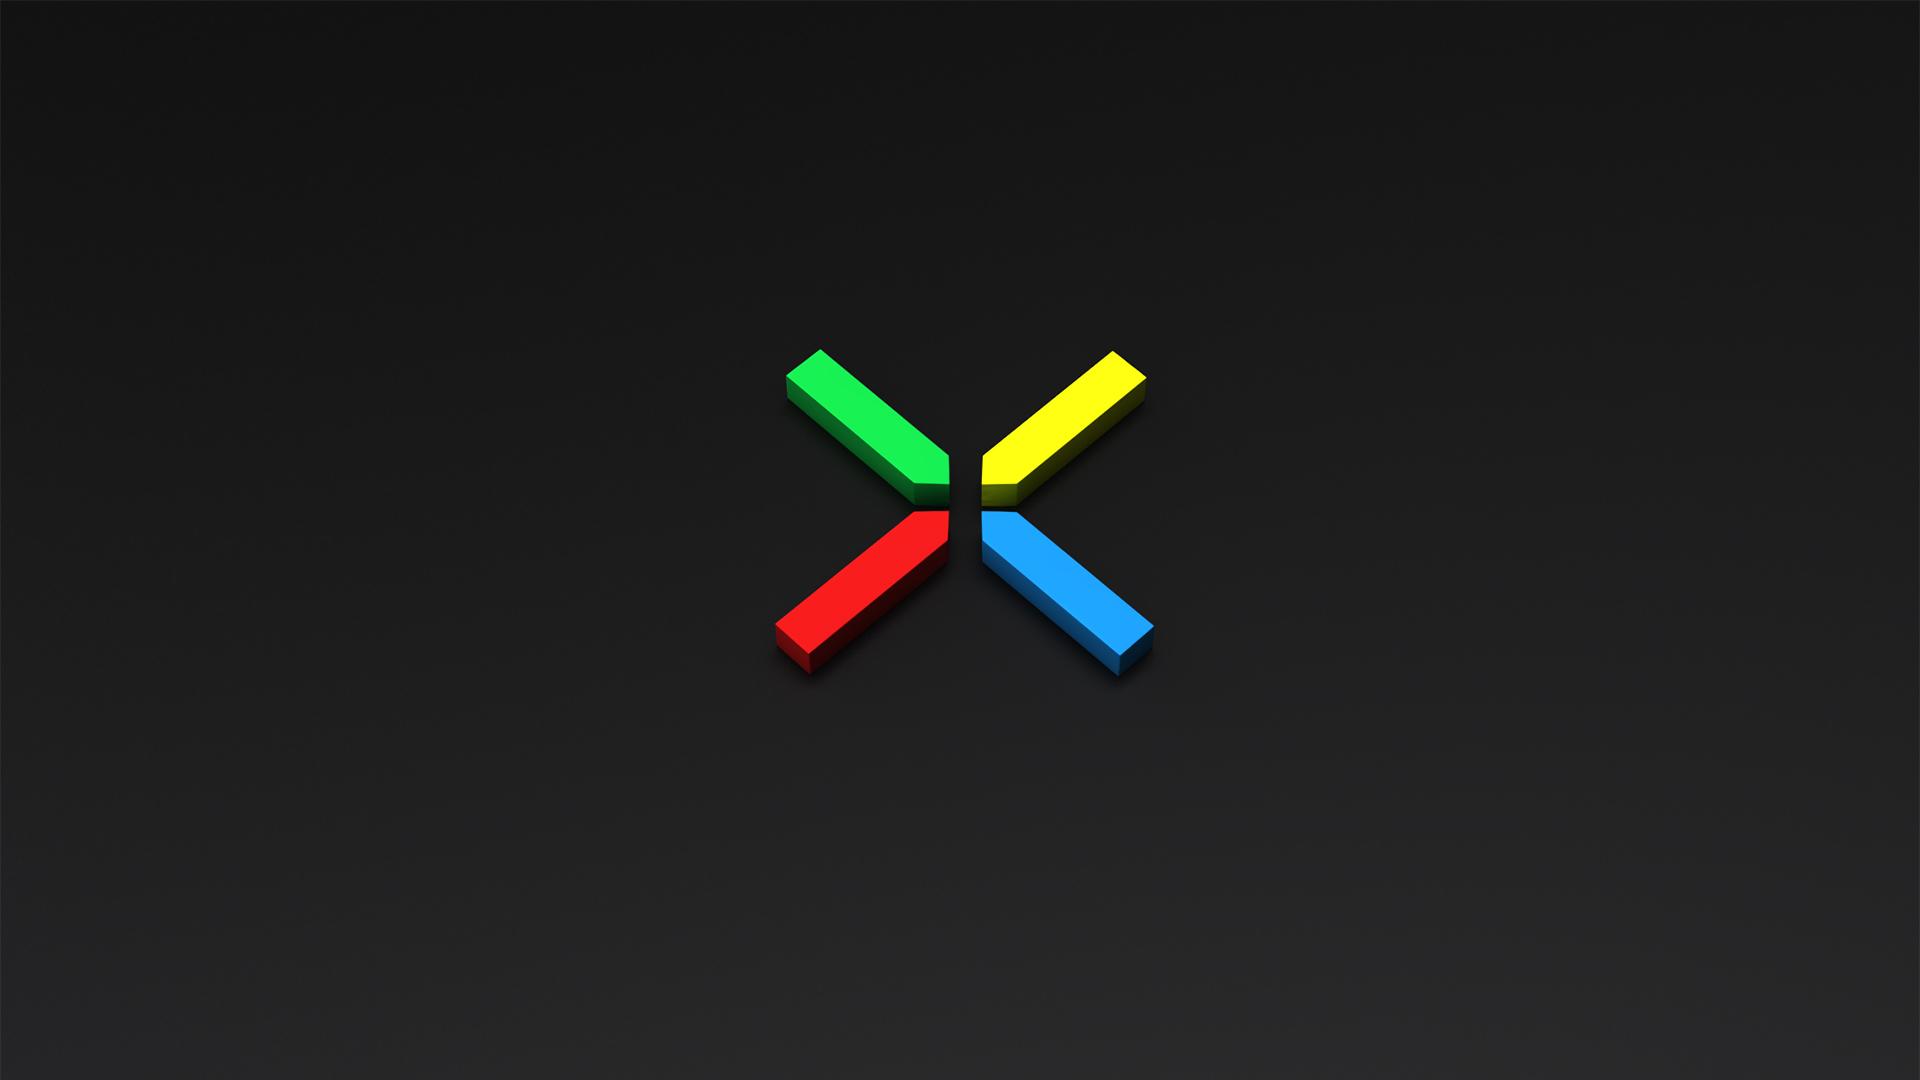 Google Nexus - Wallpaper by Silver-Fate